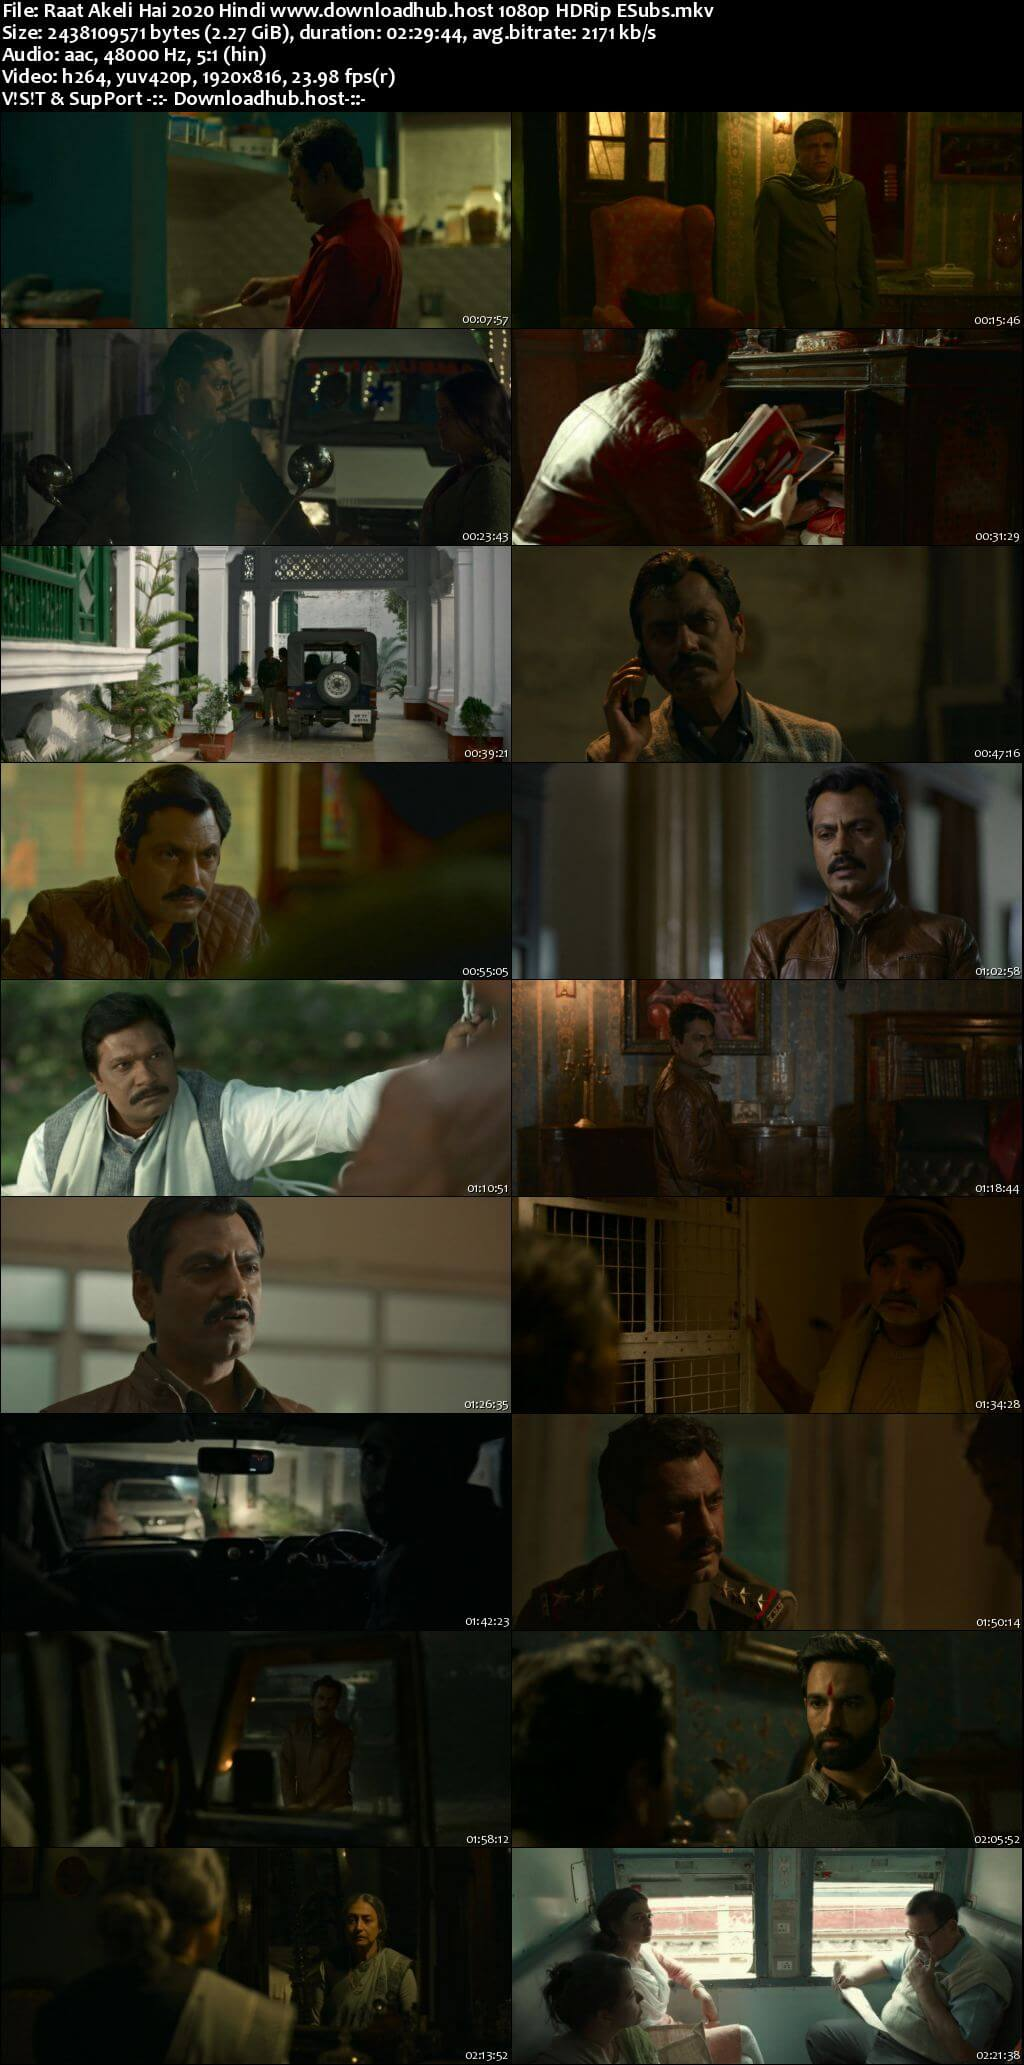 Raat Akeli Hai 2020 Hindi 1080p HDRip ESubs